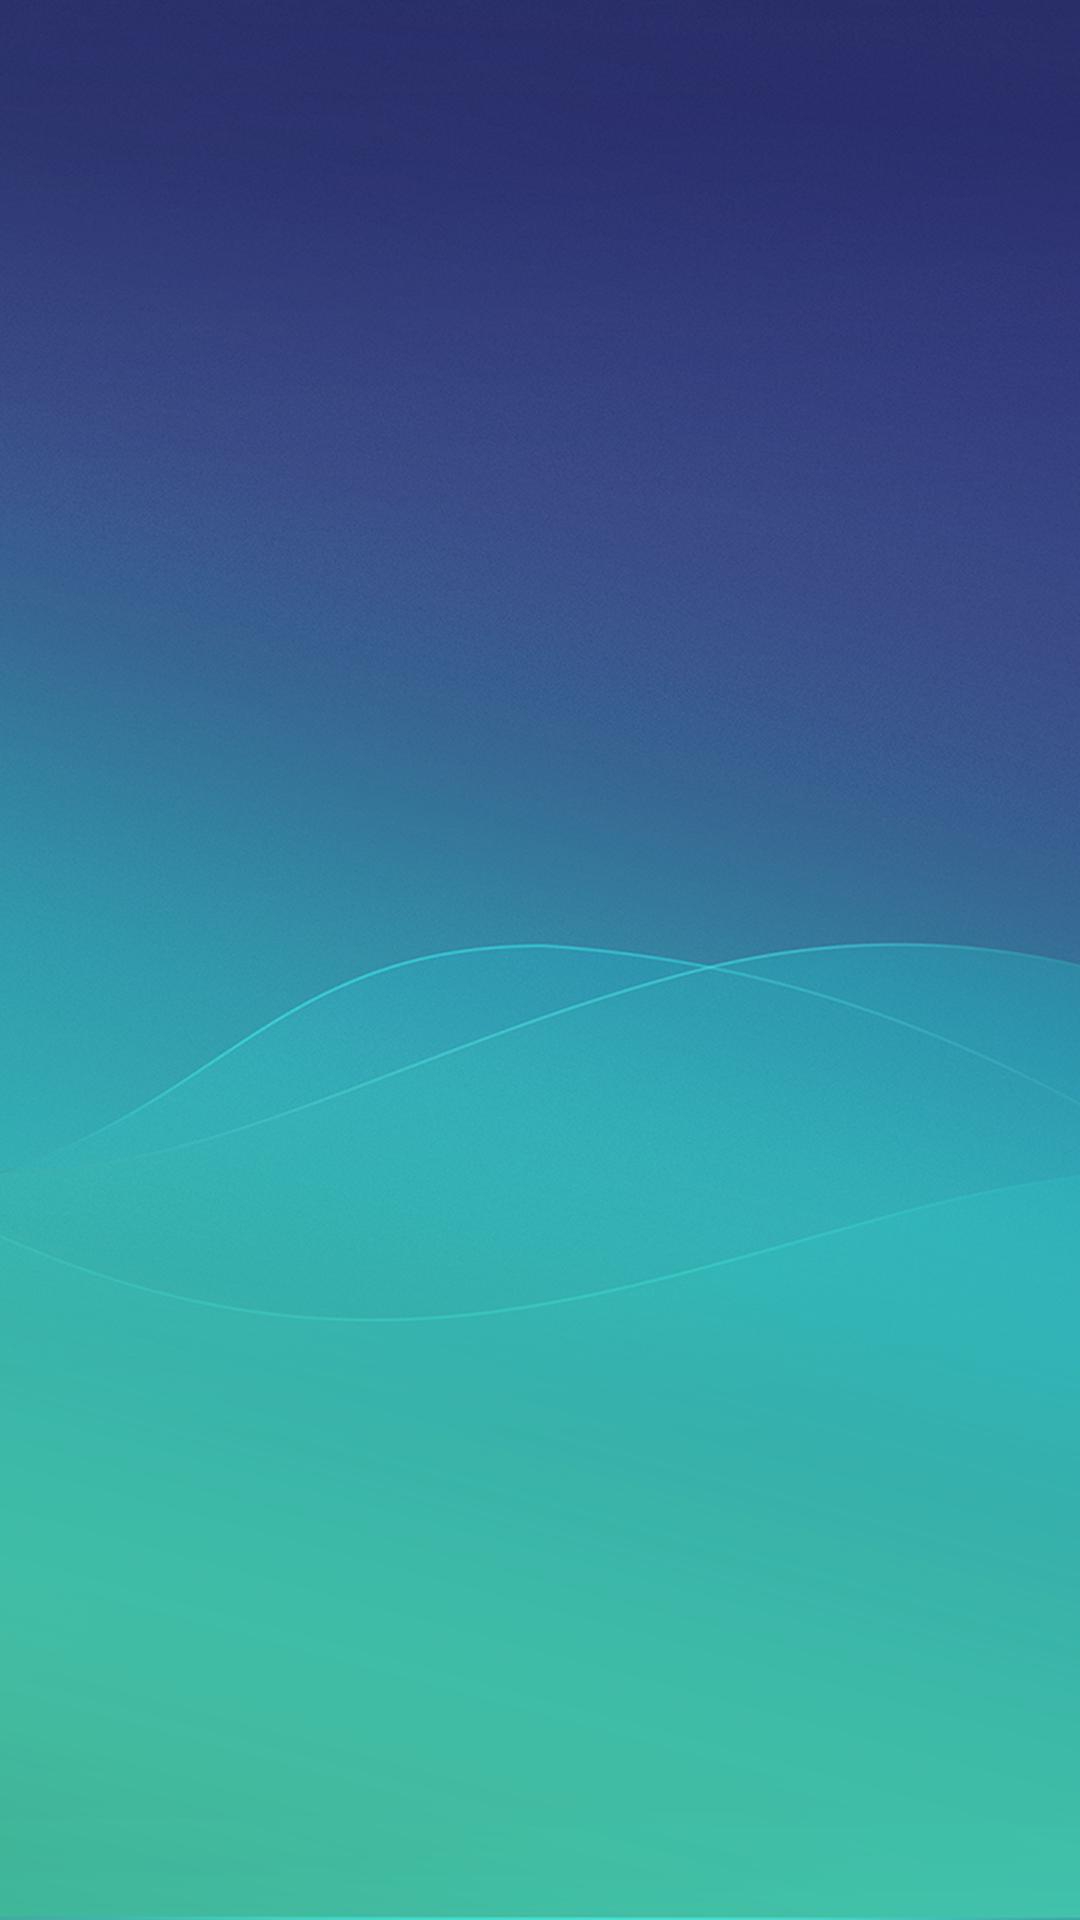 Zte Wallpaper Download Wallpaper download Galaxy 1080x1920